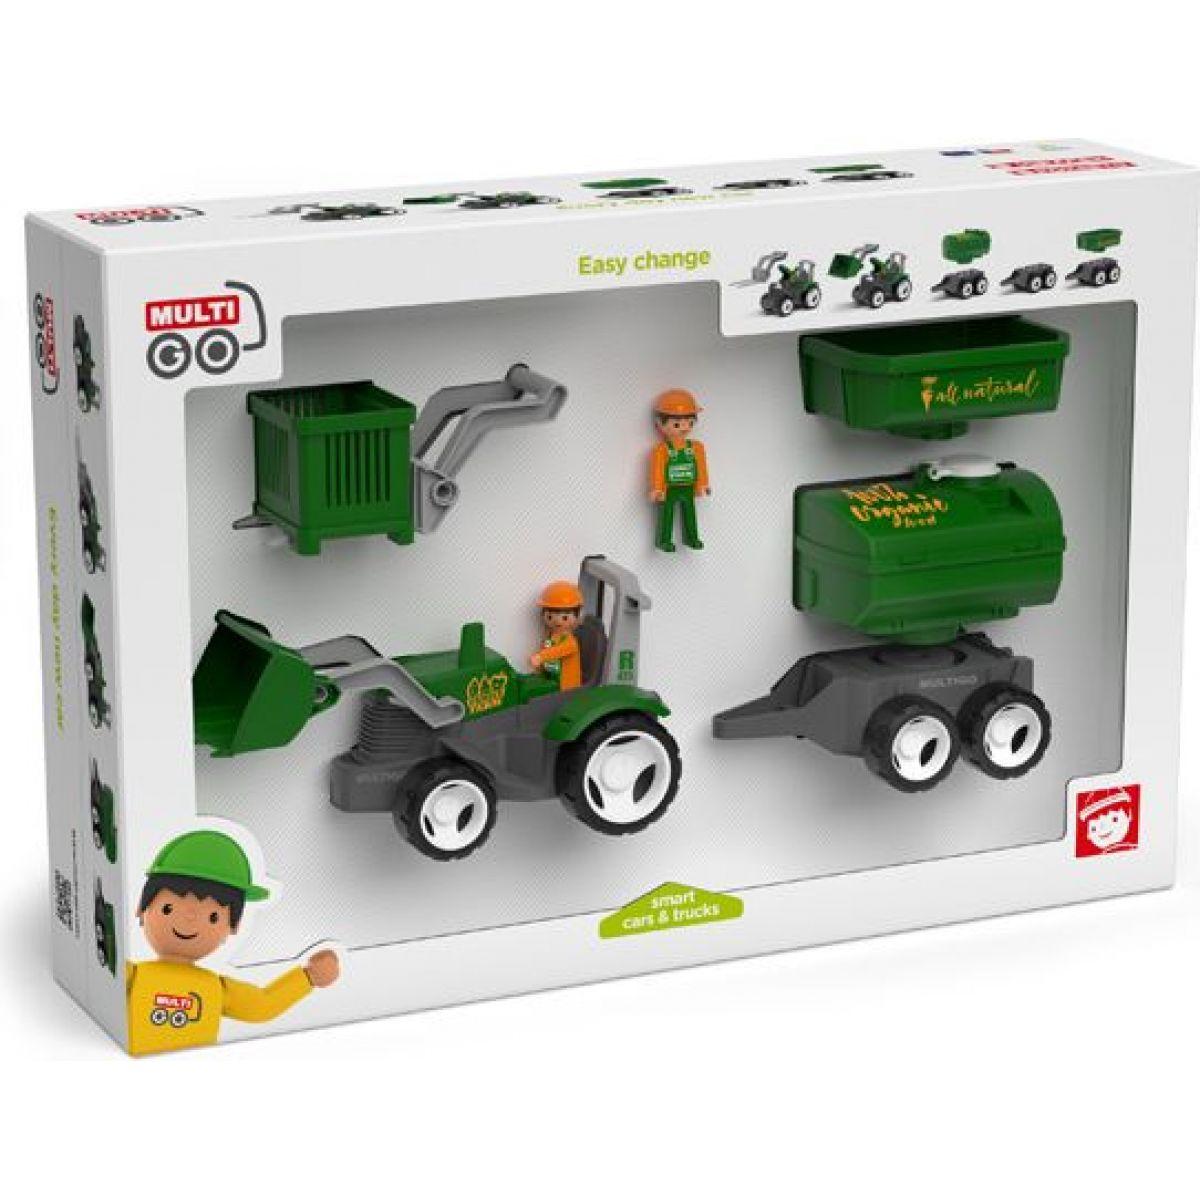 Igráček Multigo Farm Set